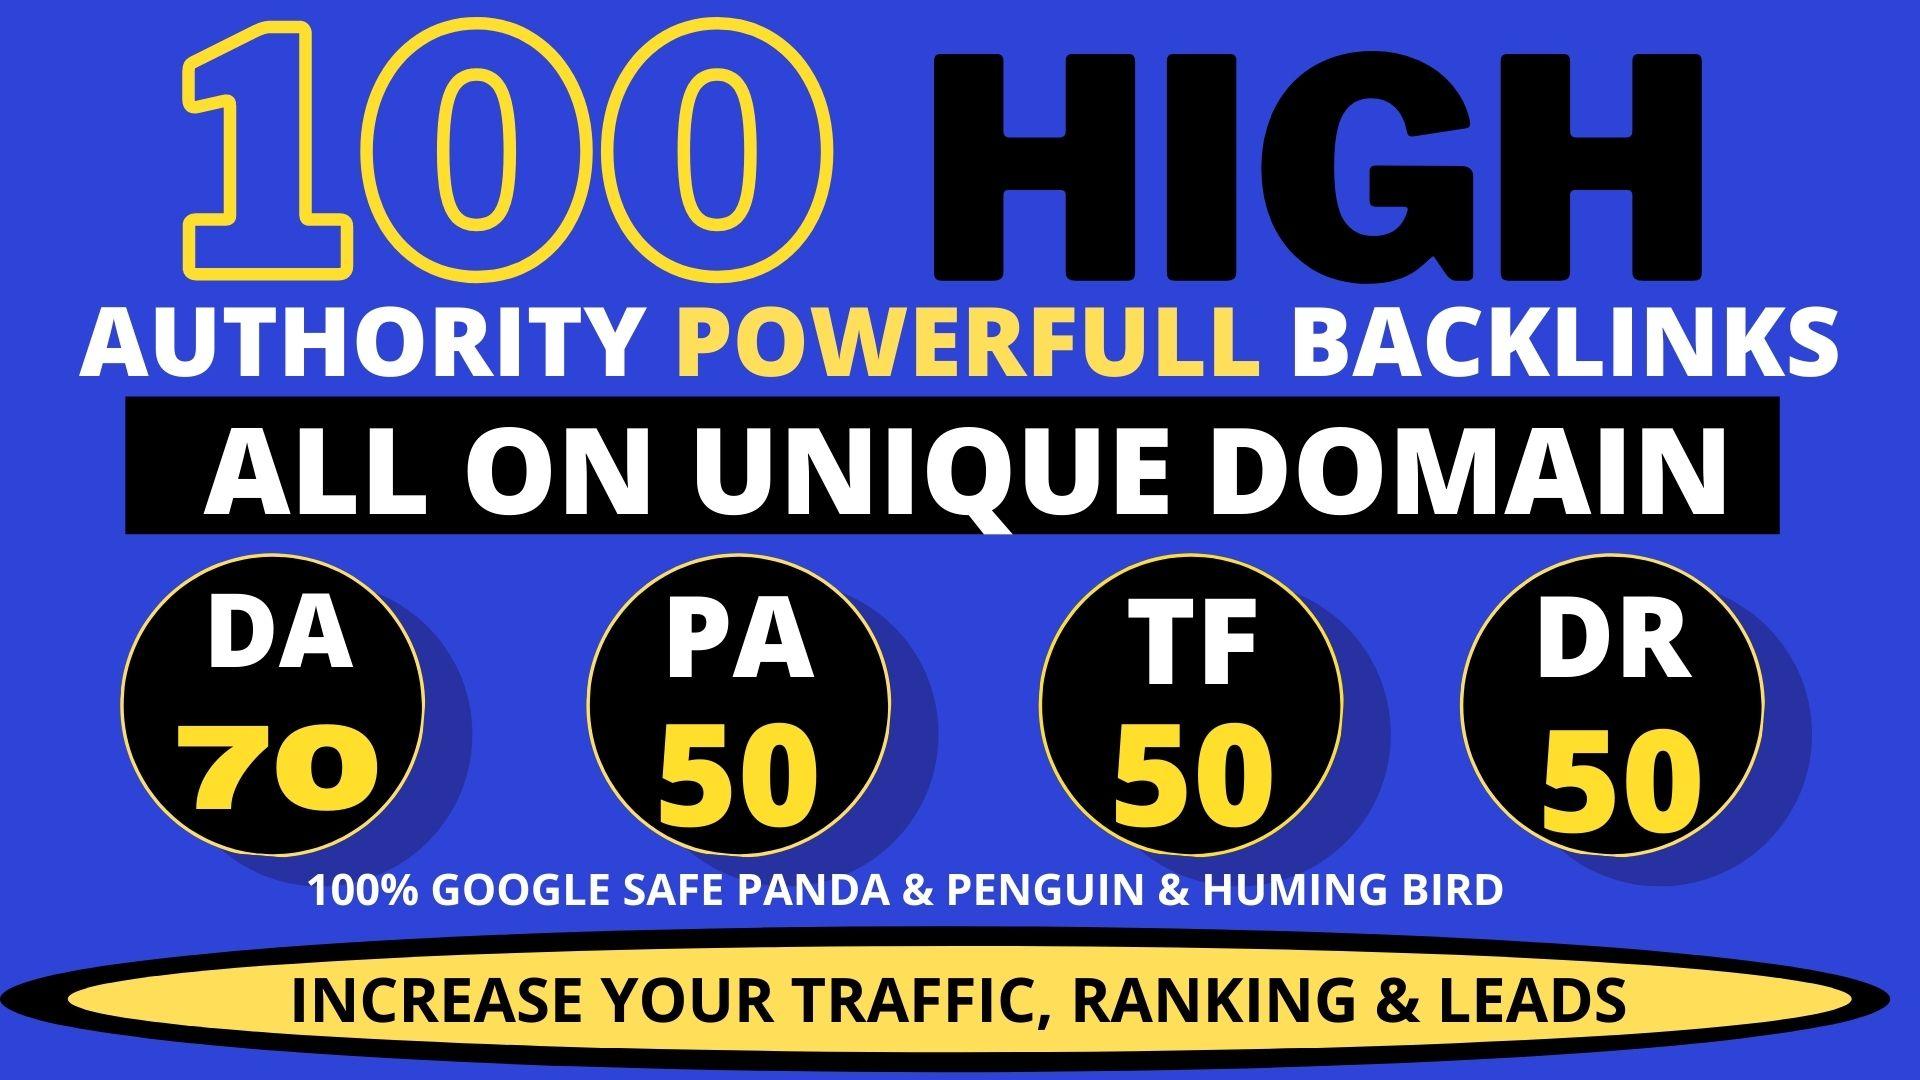 premium 100 Pbn Backlink homepage web 2.0 with permanent do-follow & High DA PA TF CF